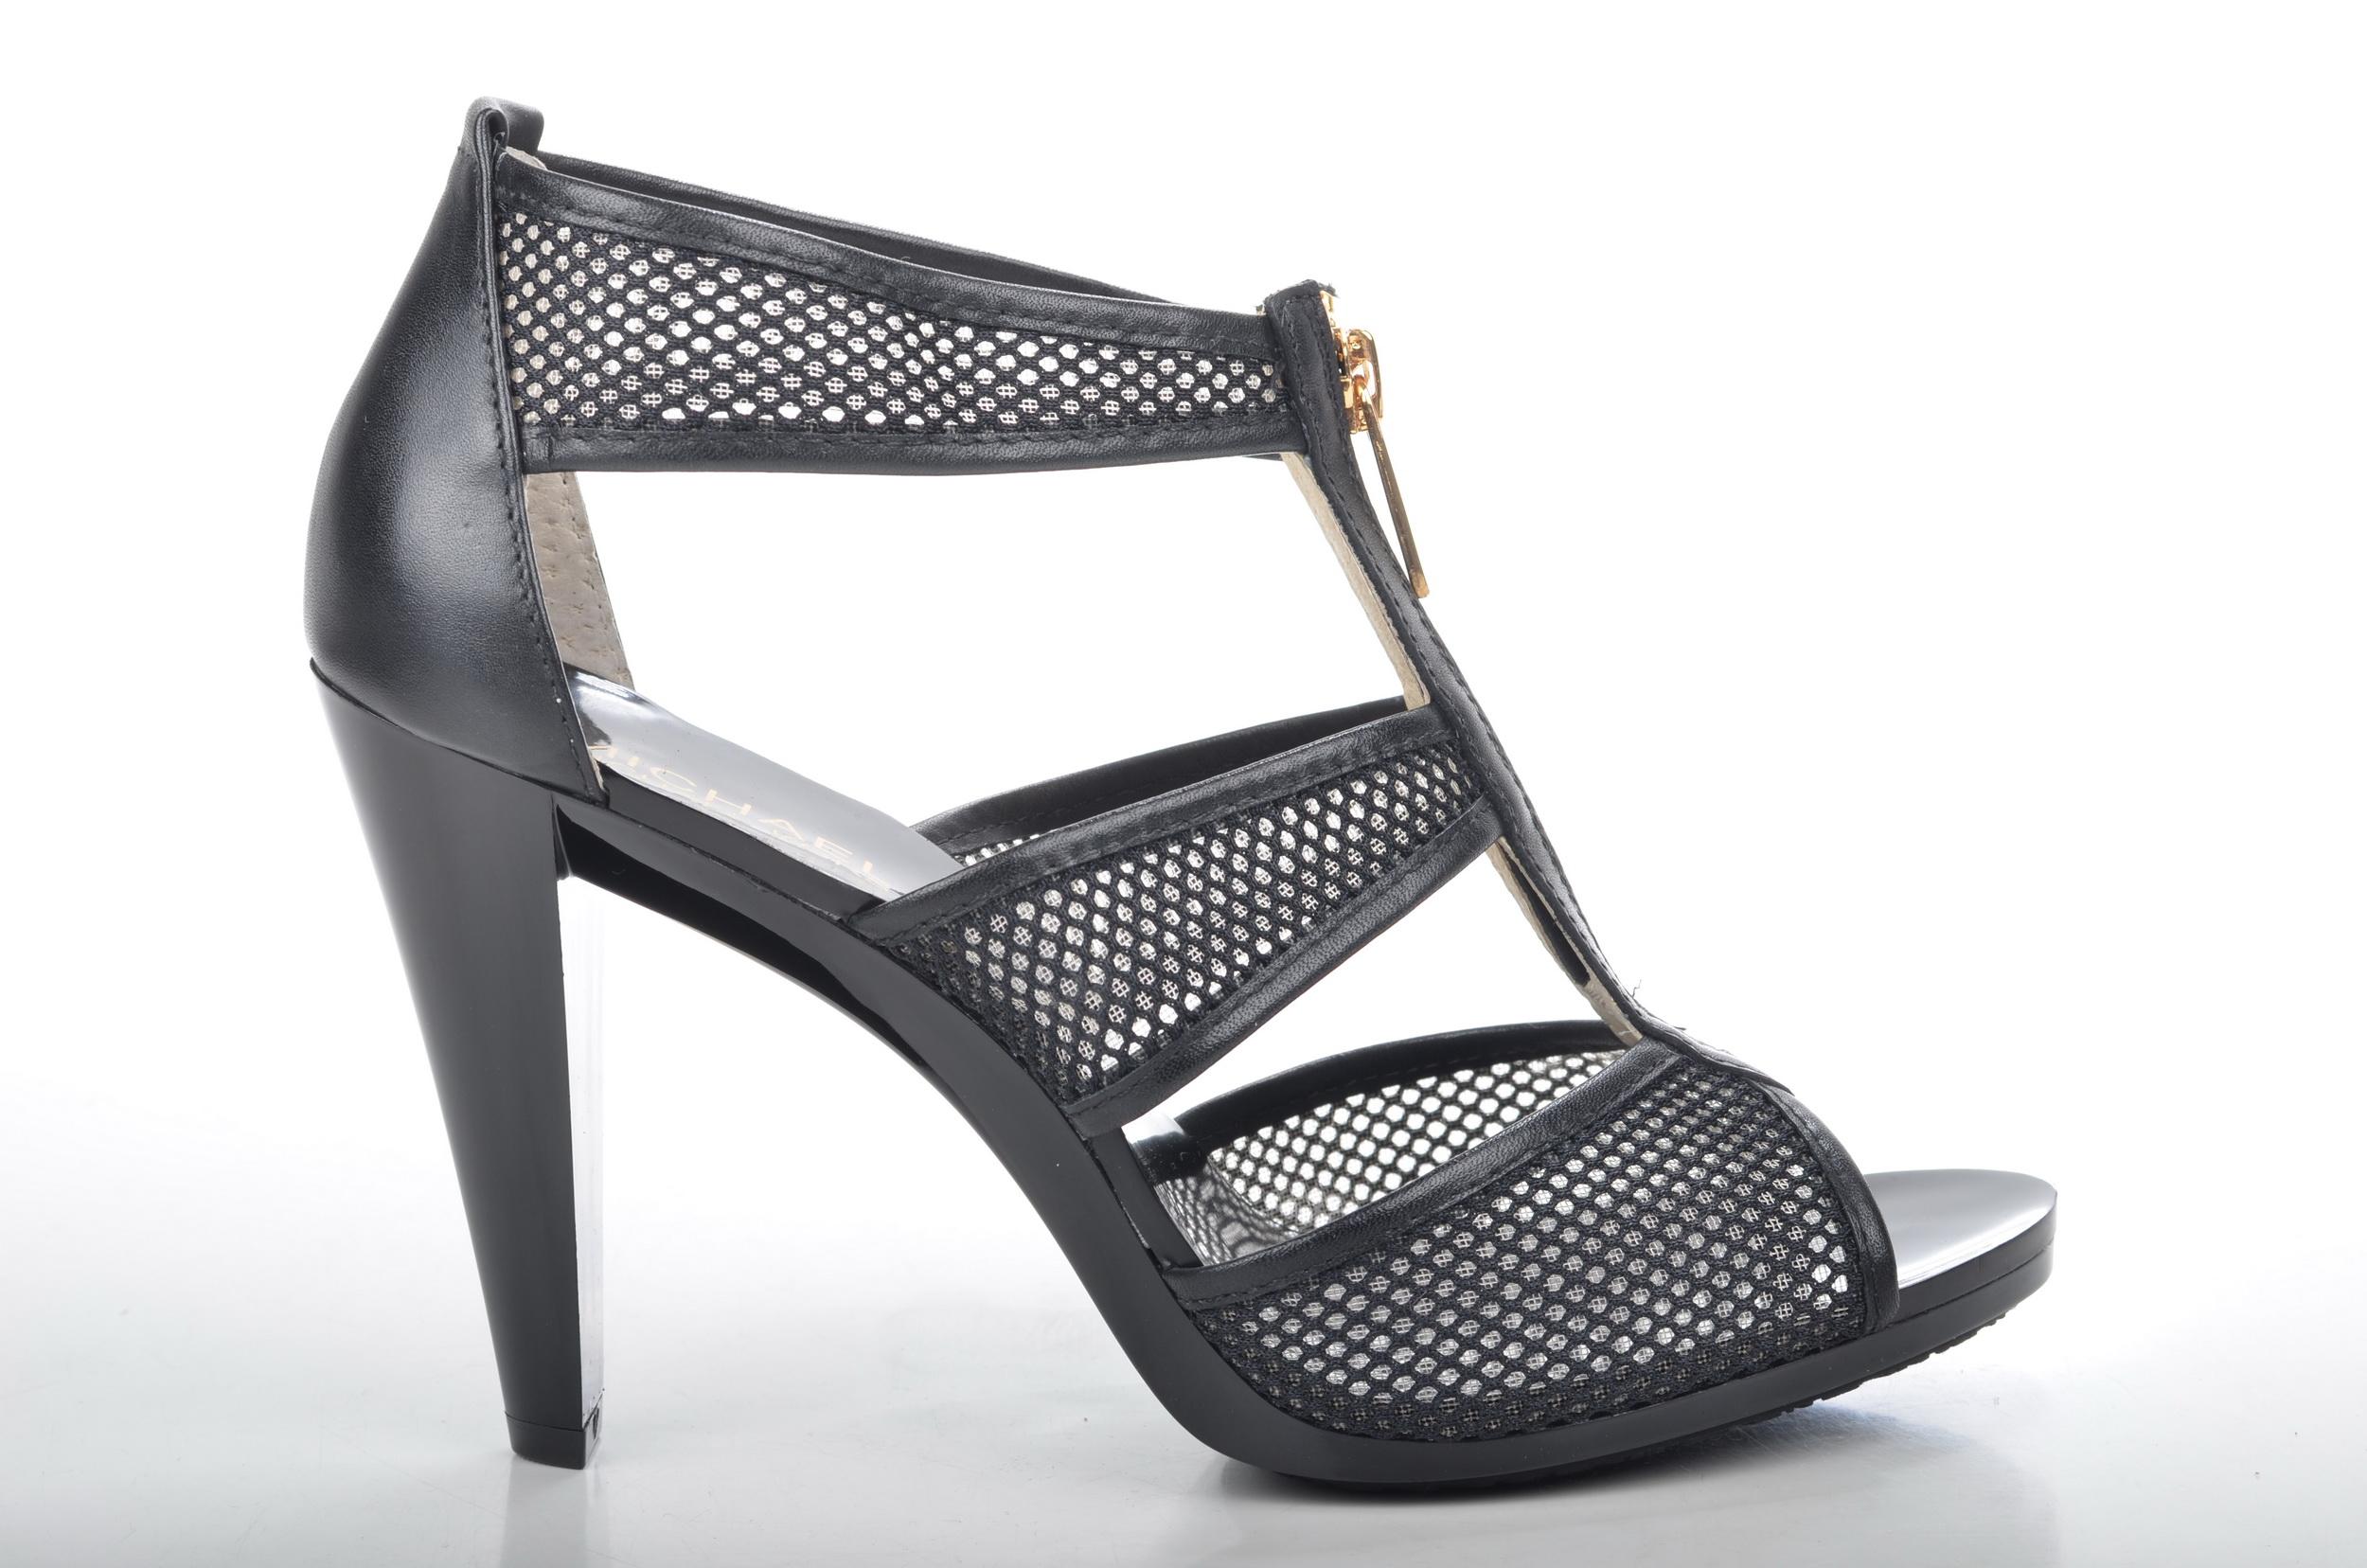 michael kors schuhe gold michael kors high top sneaker. Black Bedroom Furniture Sets. Home Design Ideas